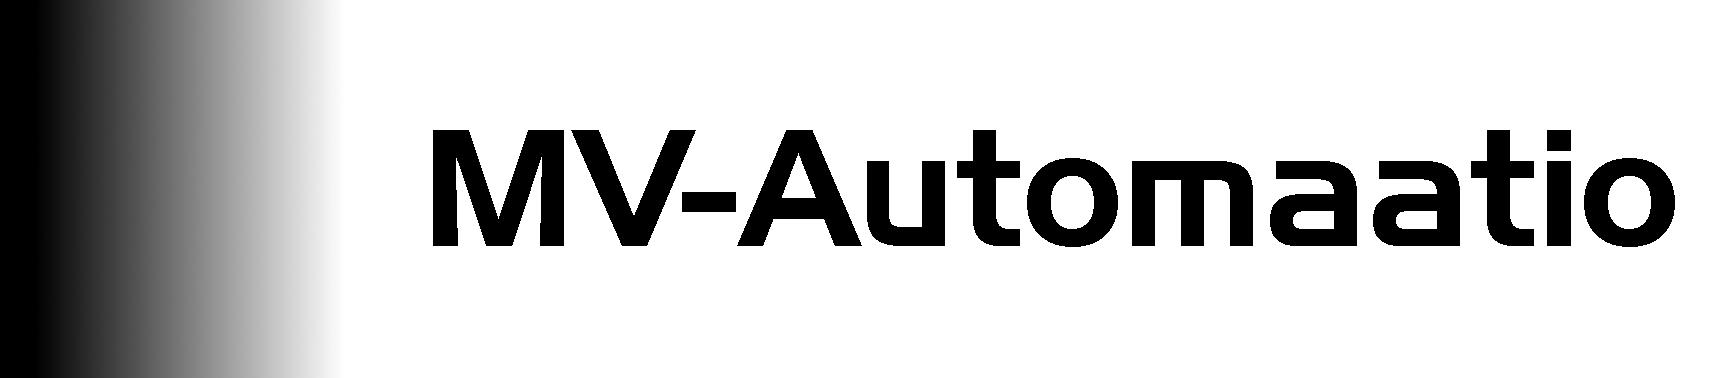 MV-Automaatio